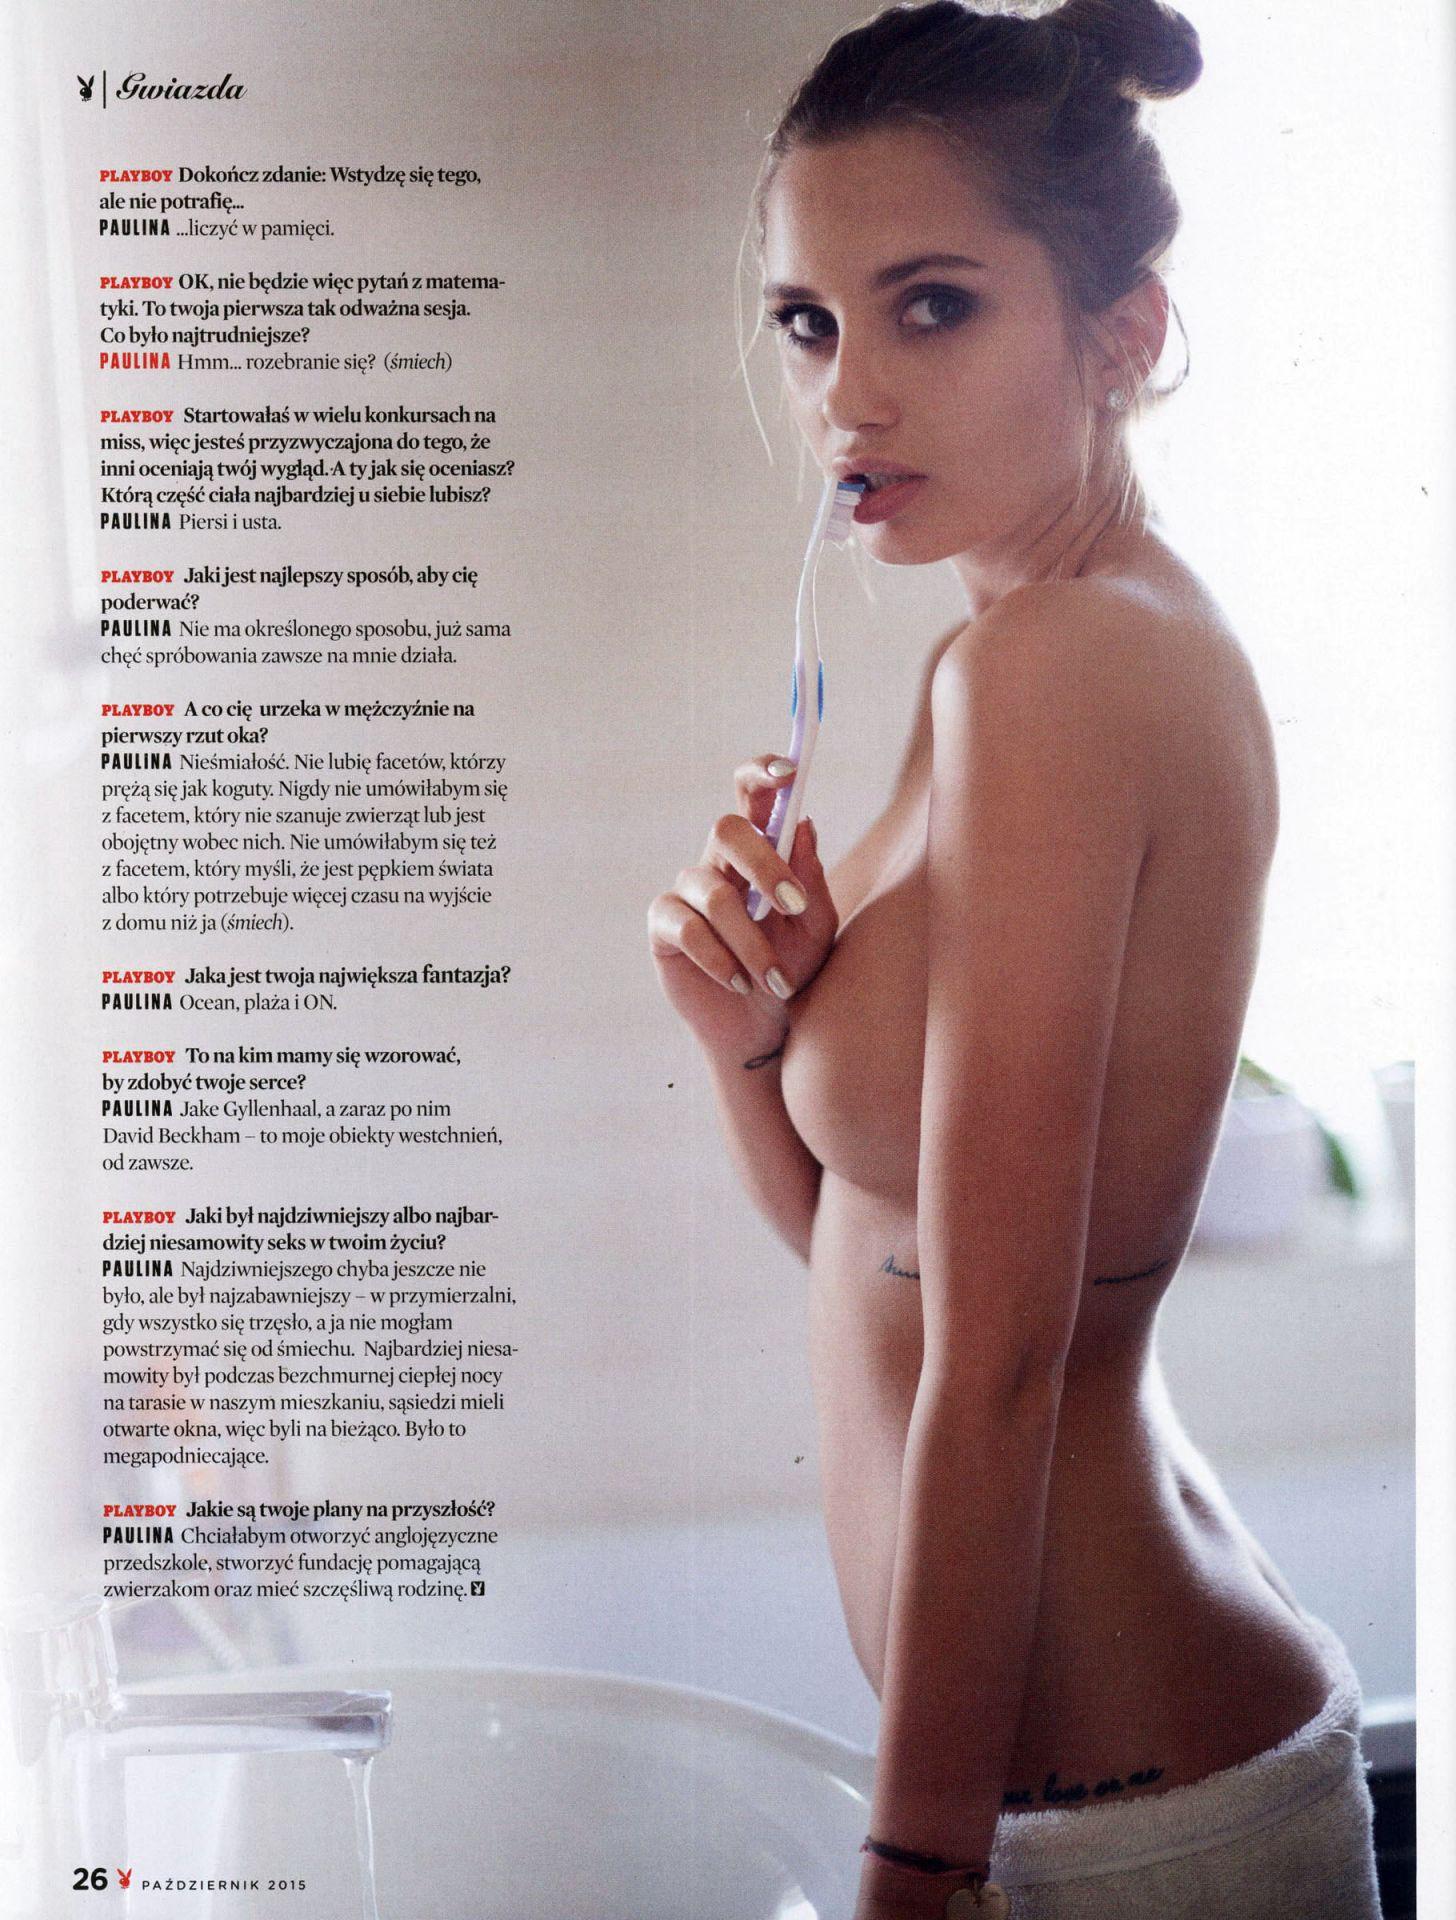 sanchez playboy nude Paulina